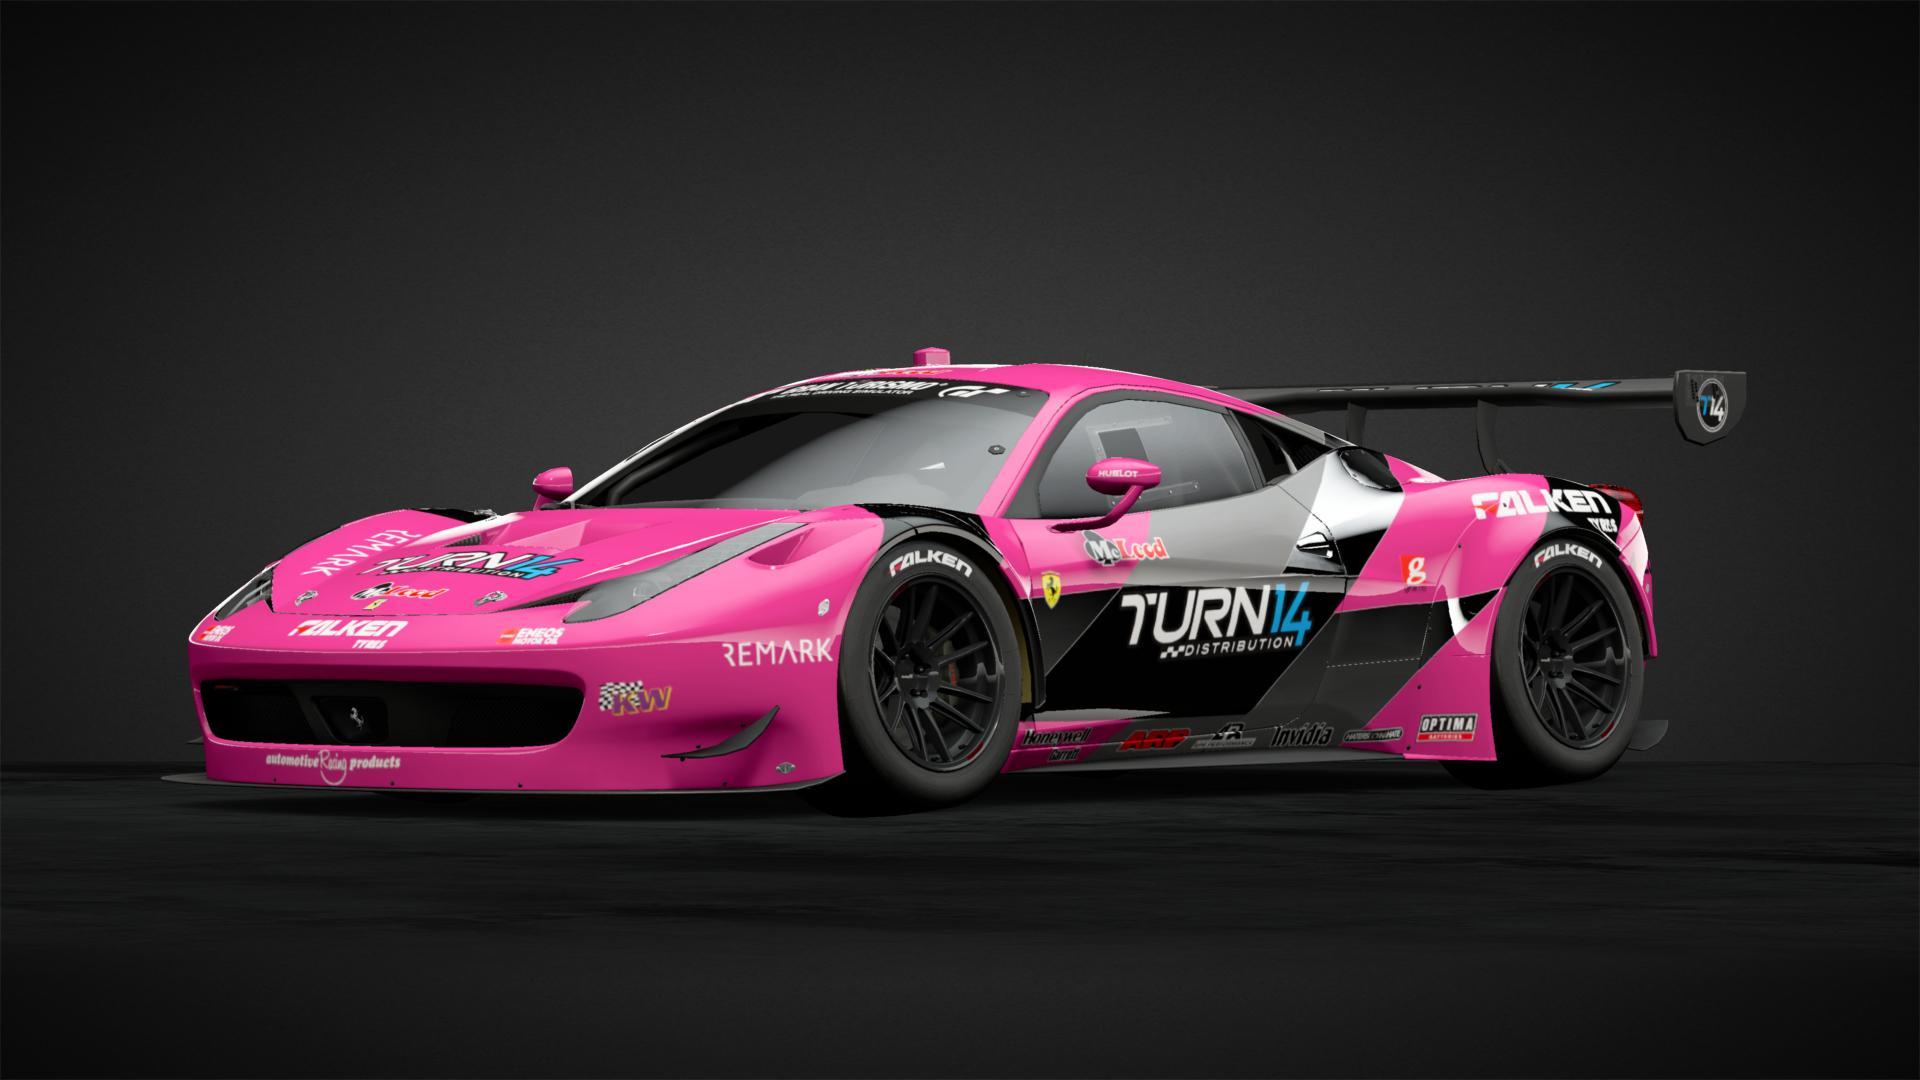 Ferrari Turn 14 Drift Car Car Livery By Ayla2004james Community Gran Turismo Sport